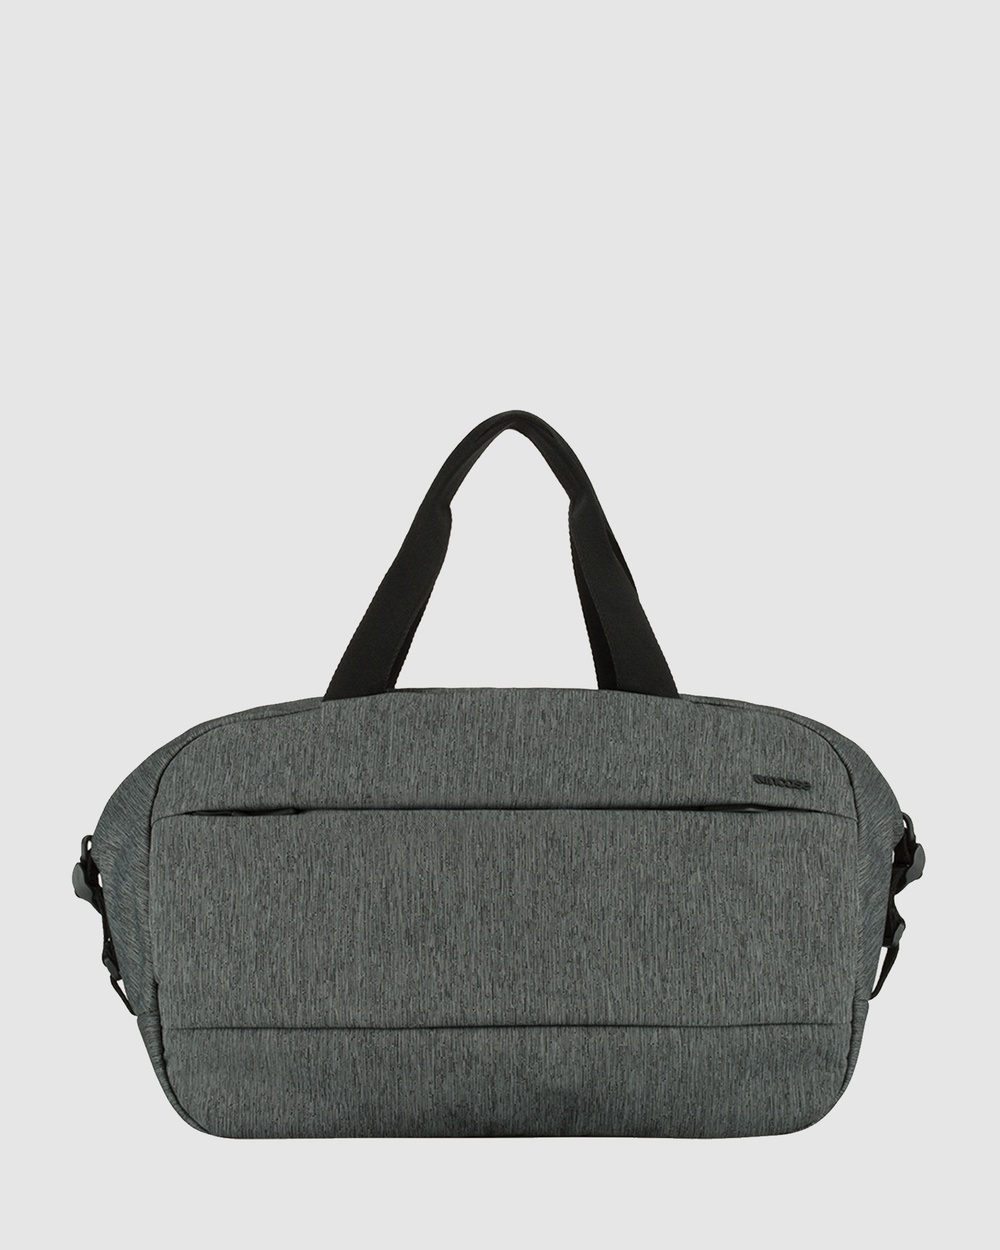 Incase City Duffel Duffle Bags Grey